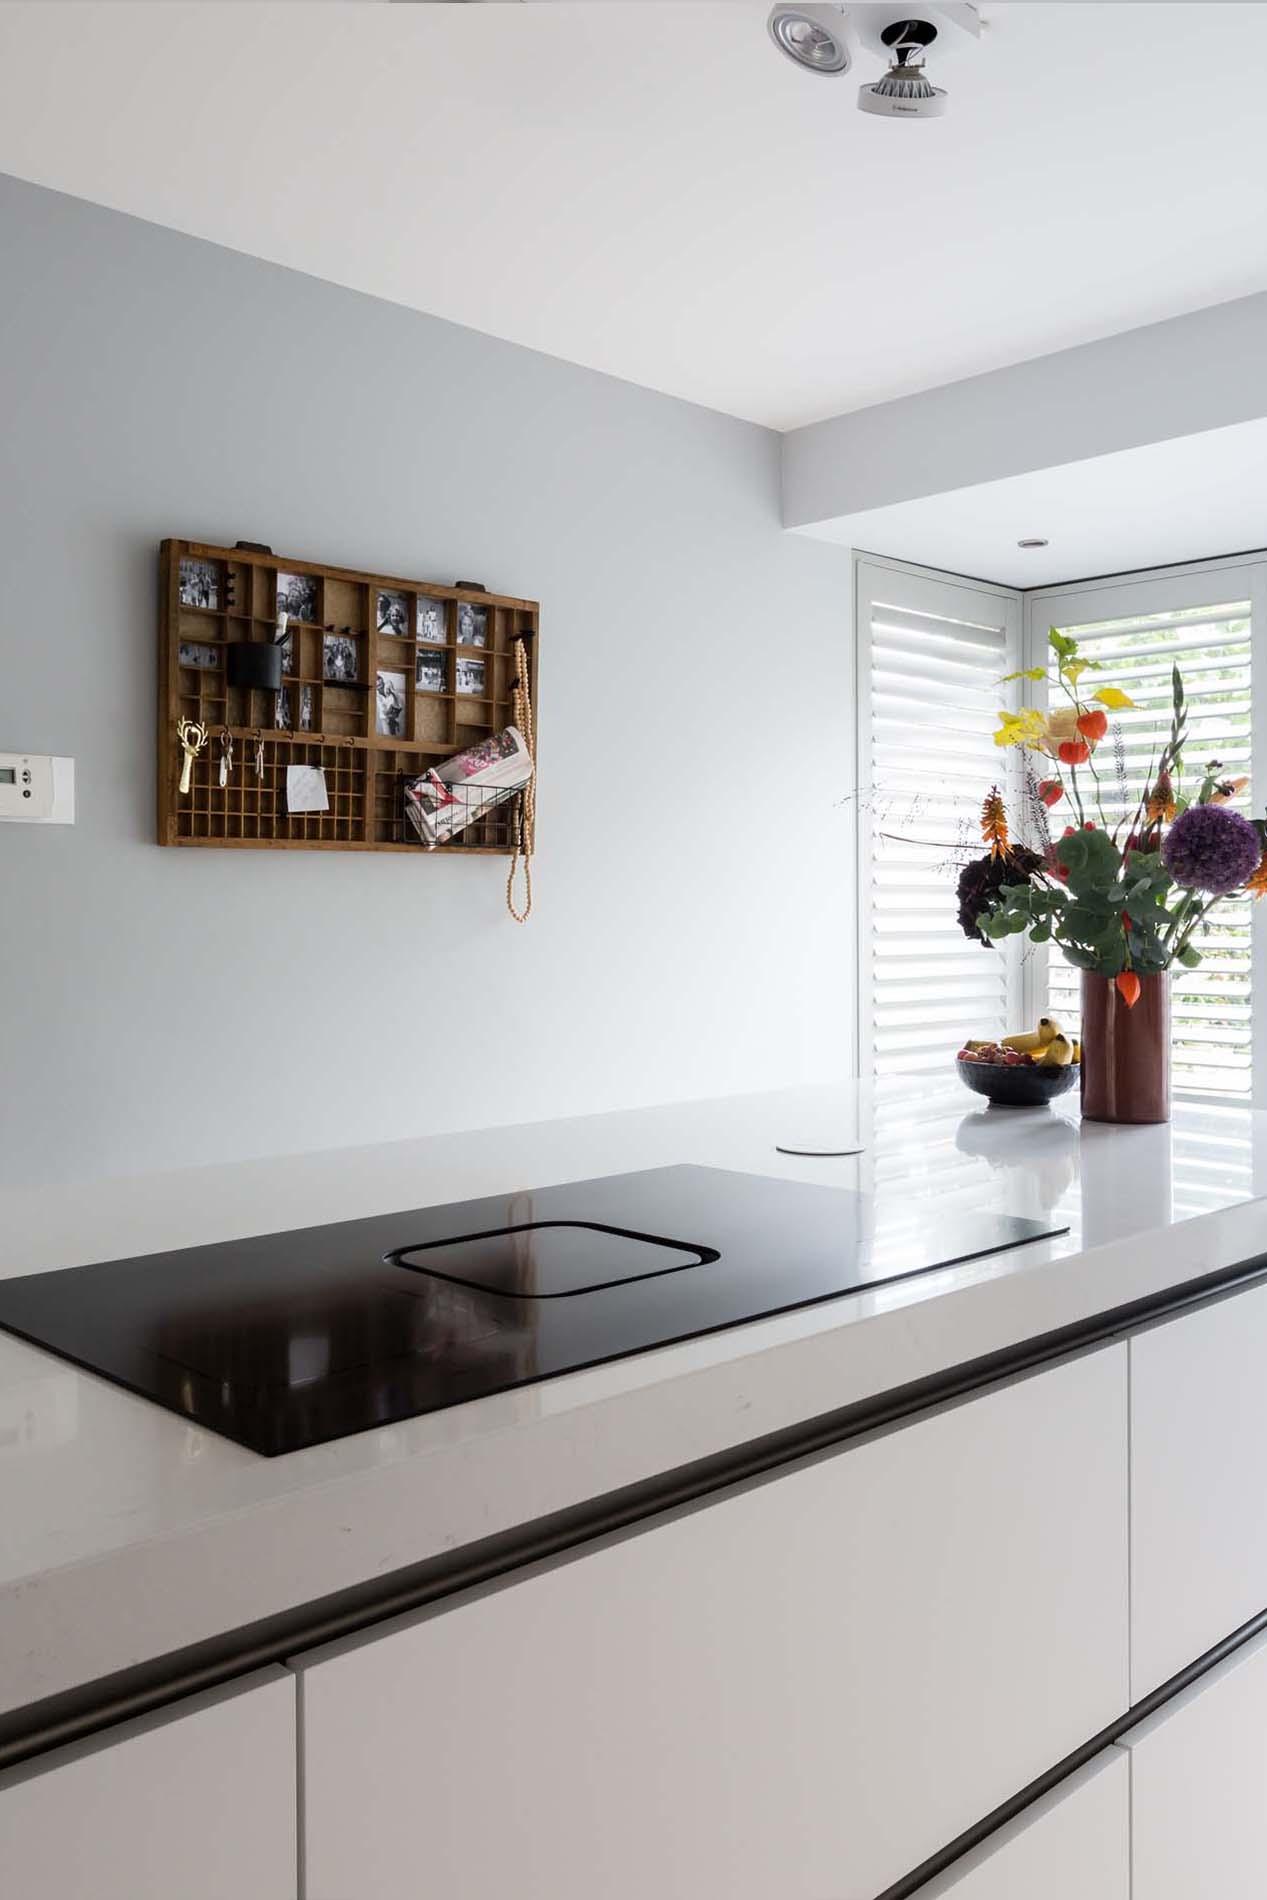 vtwonen keuken met ATAG hood-in-hob inductiekookplaat met afzuiging, Keukenapparatuur ASWA Keukens